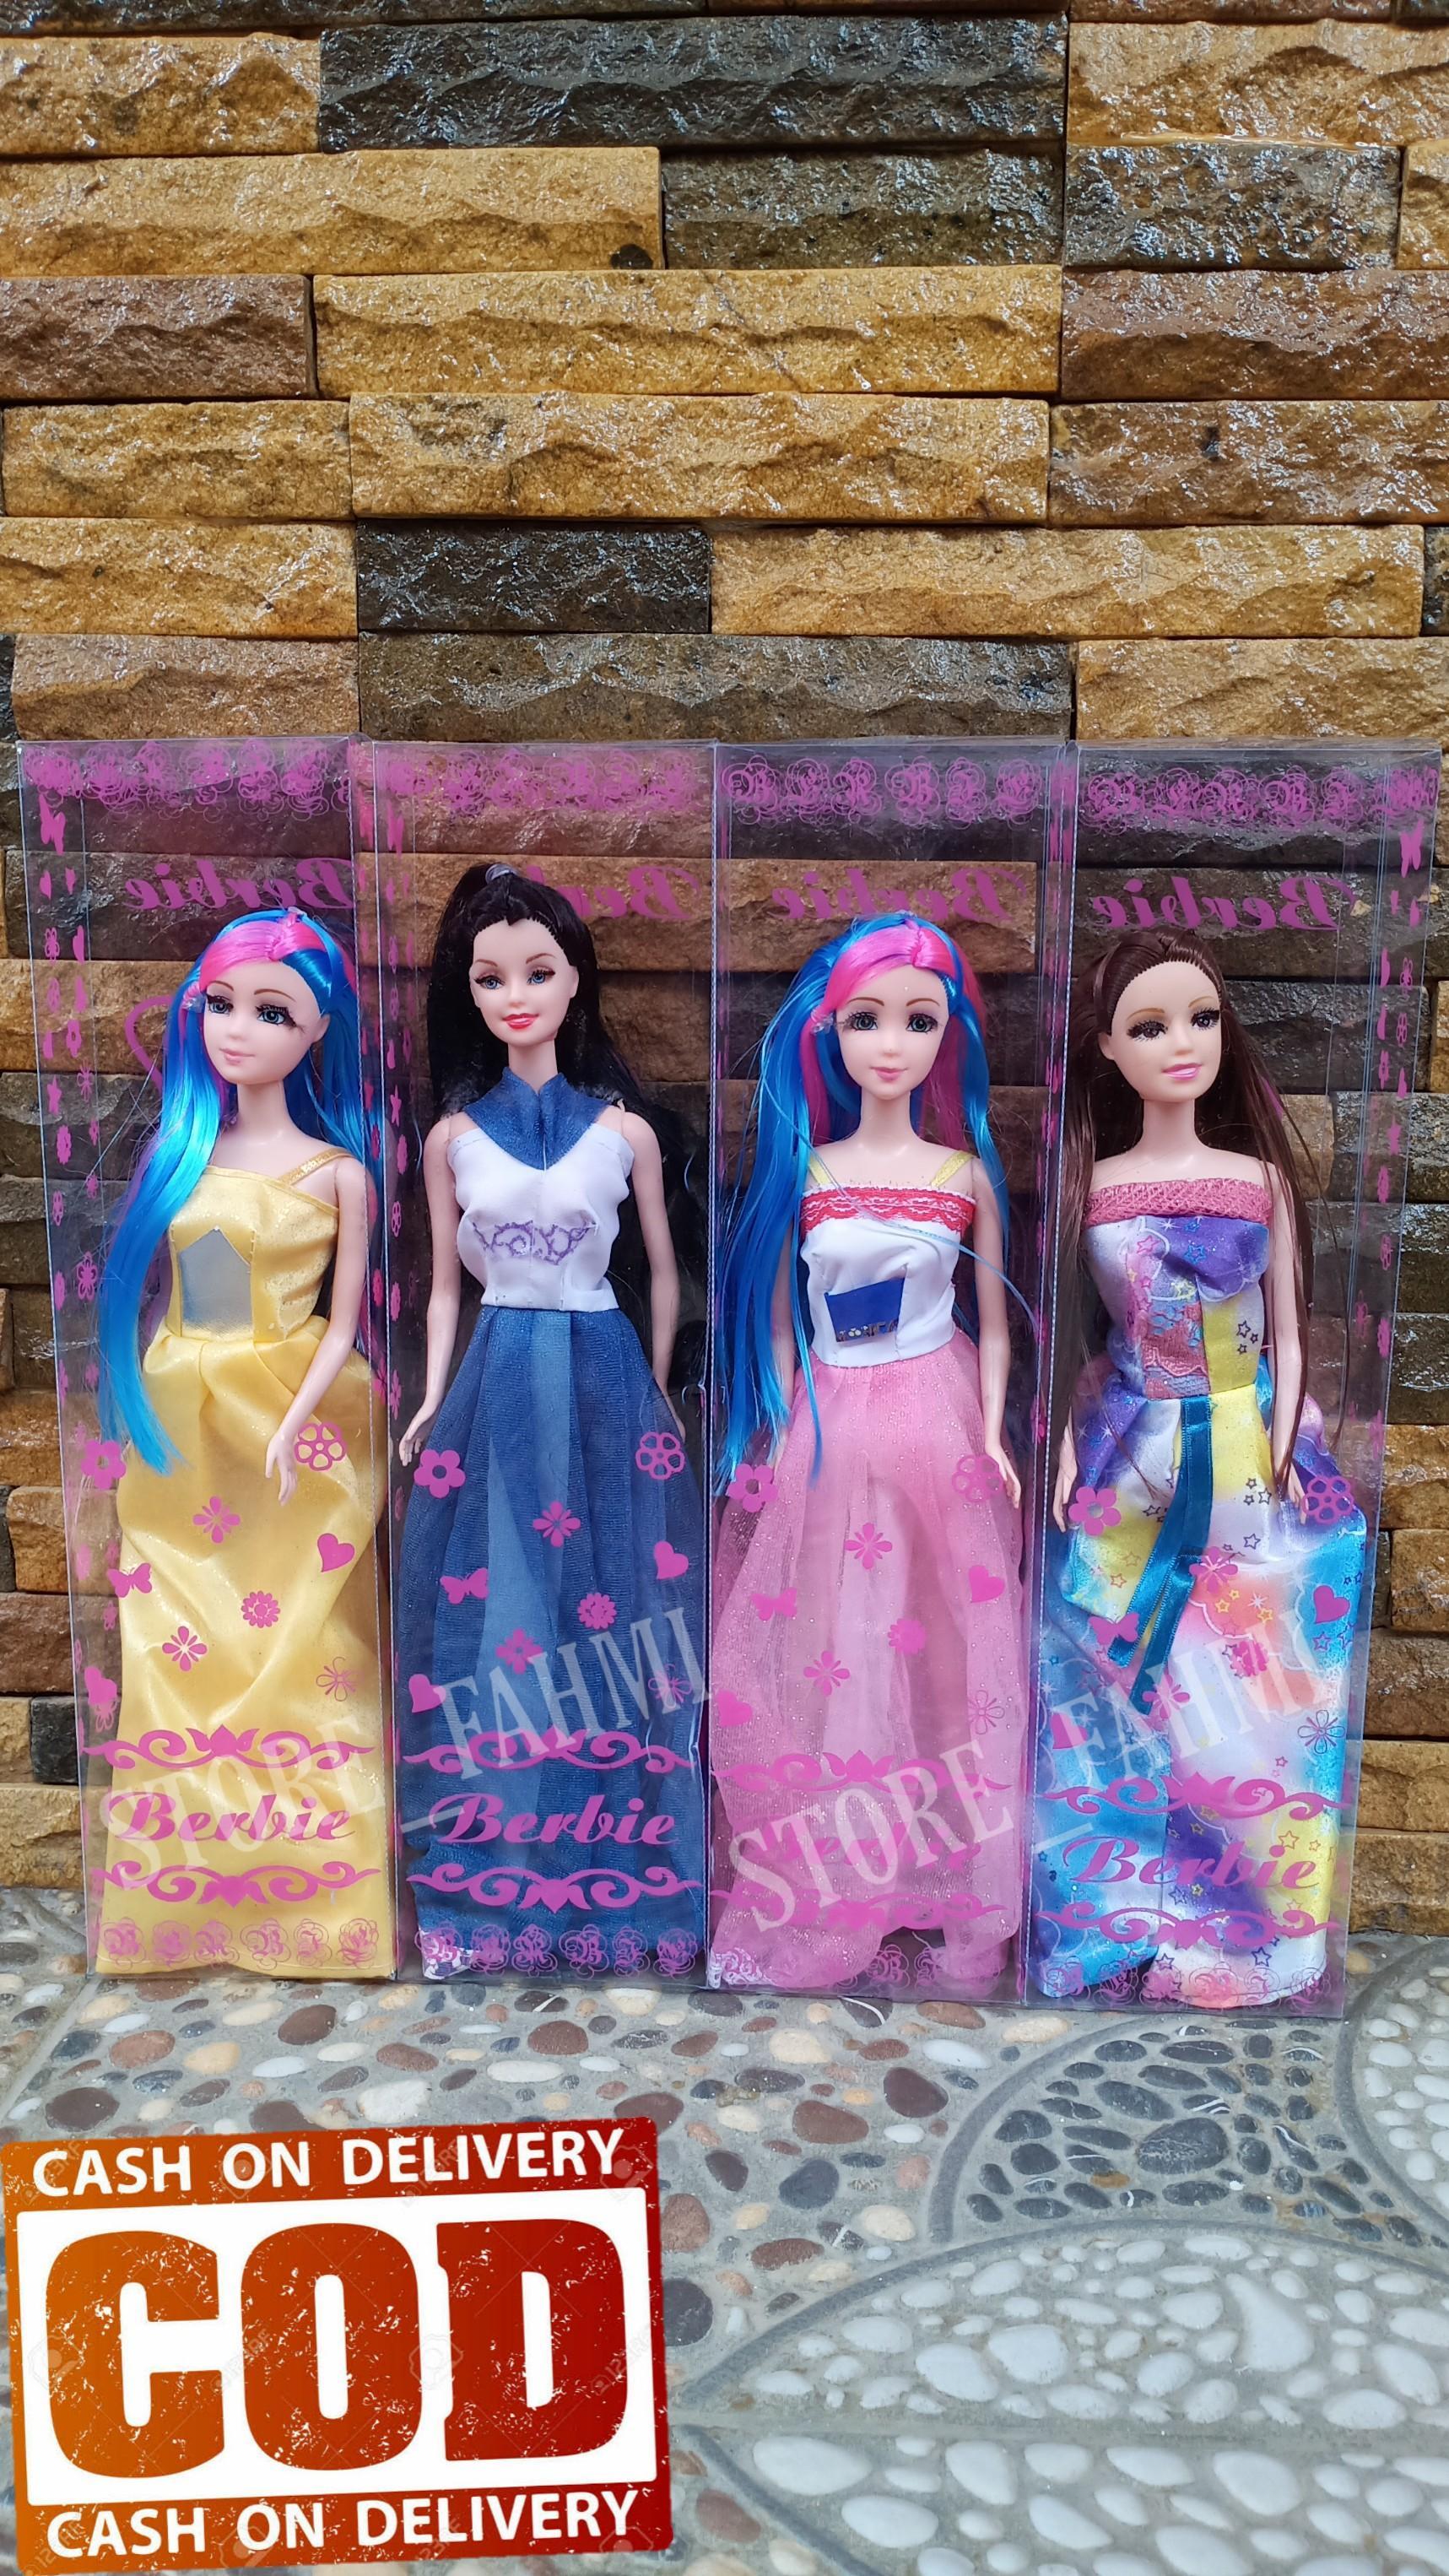 Terbaru Boneka Berbi Murah Boneka Berbi Boneka Berbi Mainan Boneka Boneka Mainan Mainan Cewek Mainan Cowok Kado Anak Store Fahmi Rudy Fandi Lazada Indonesia